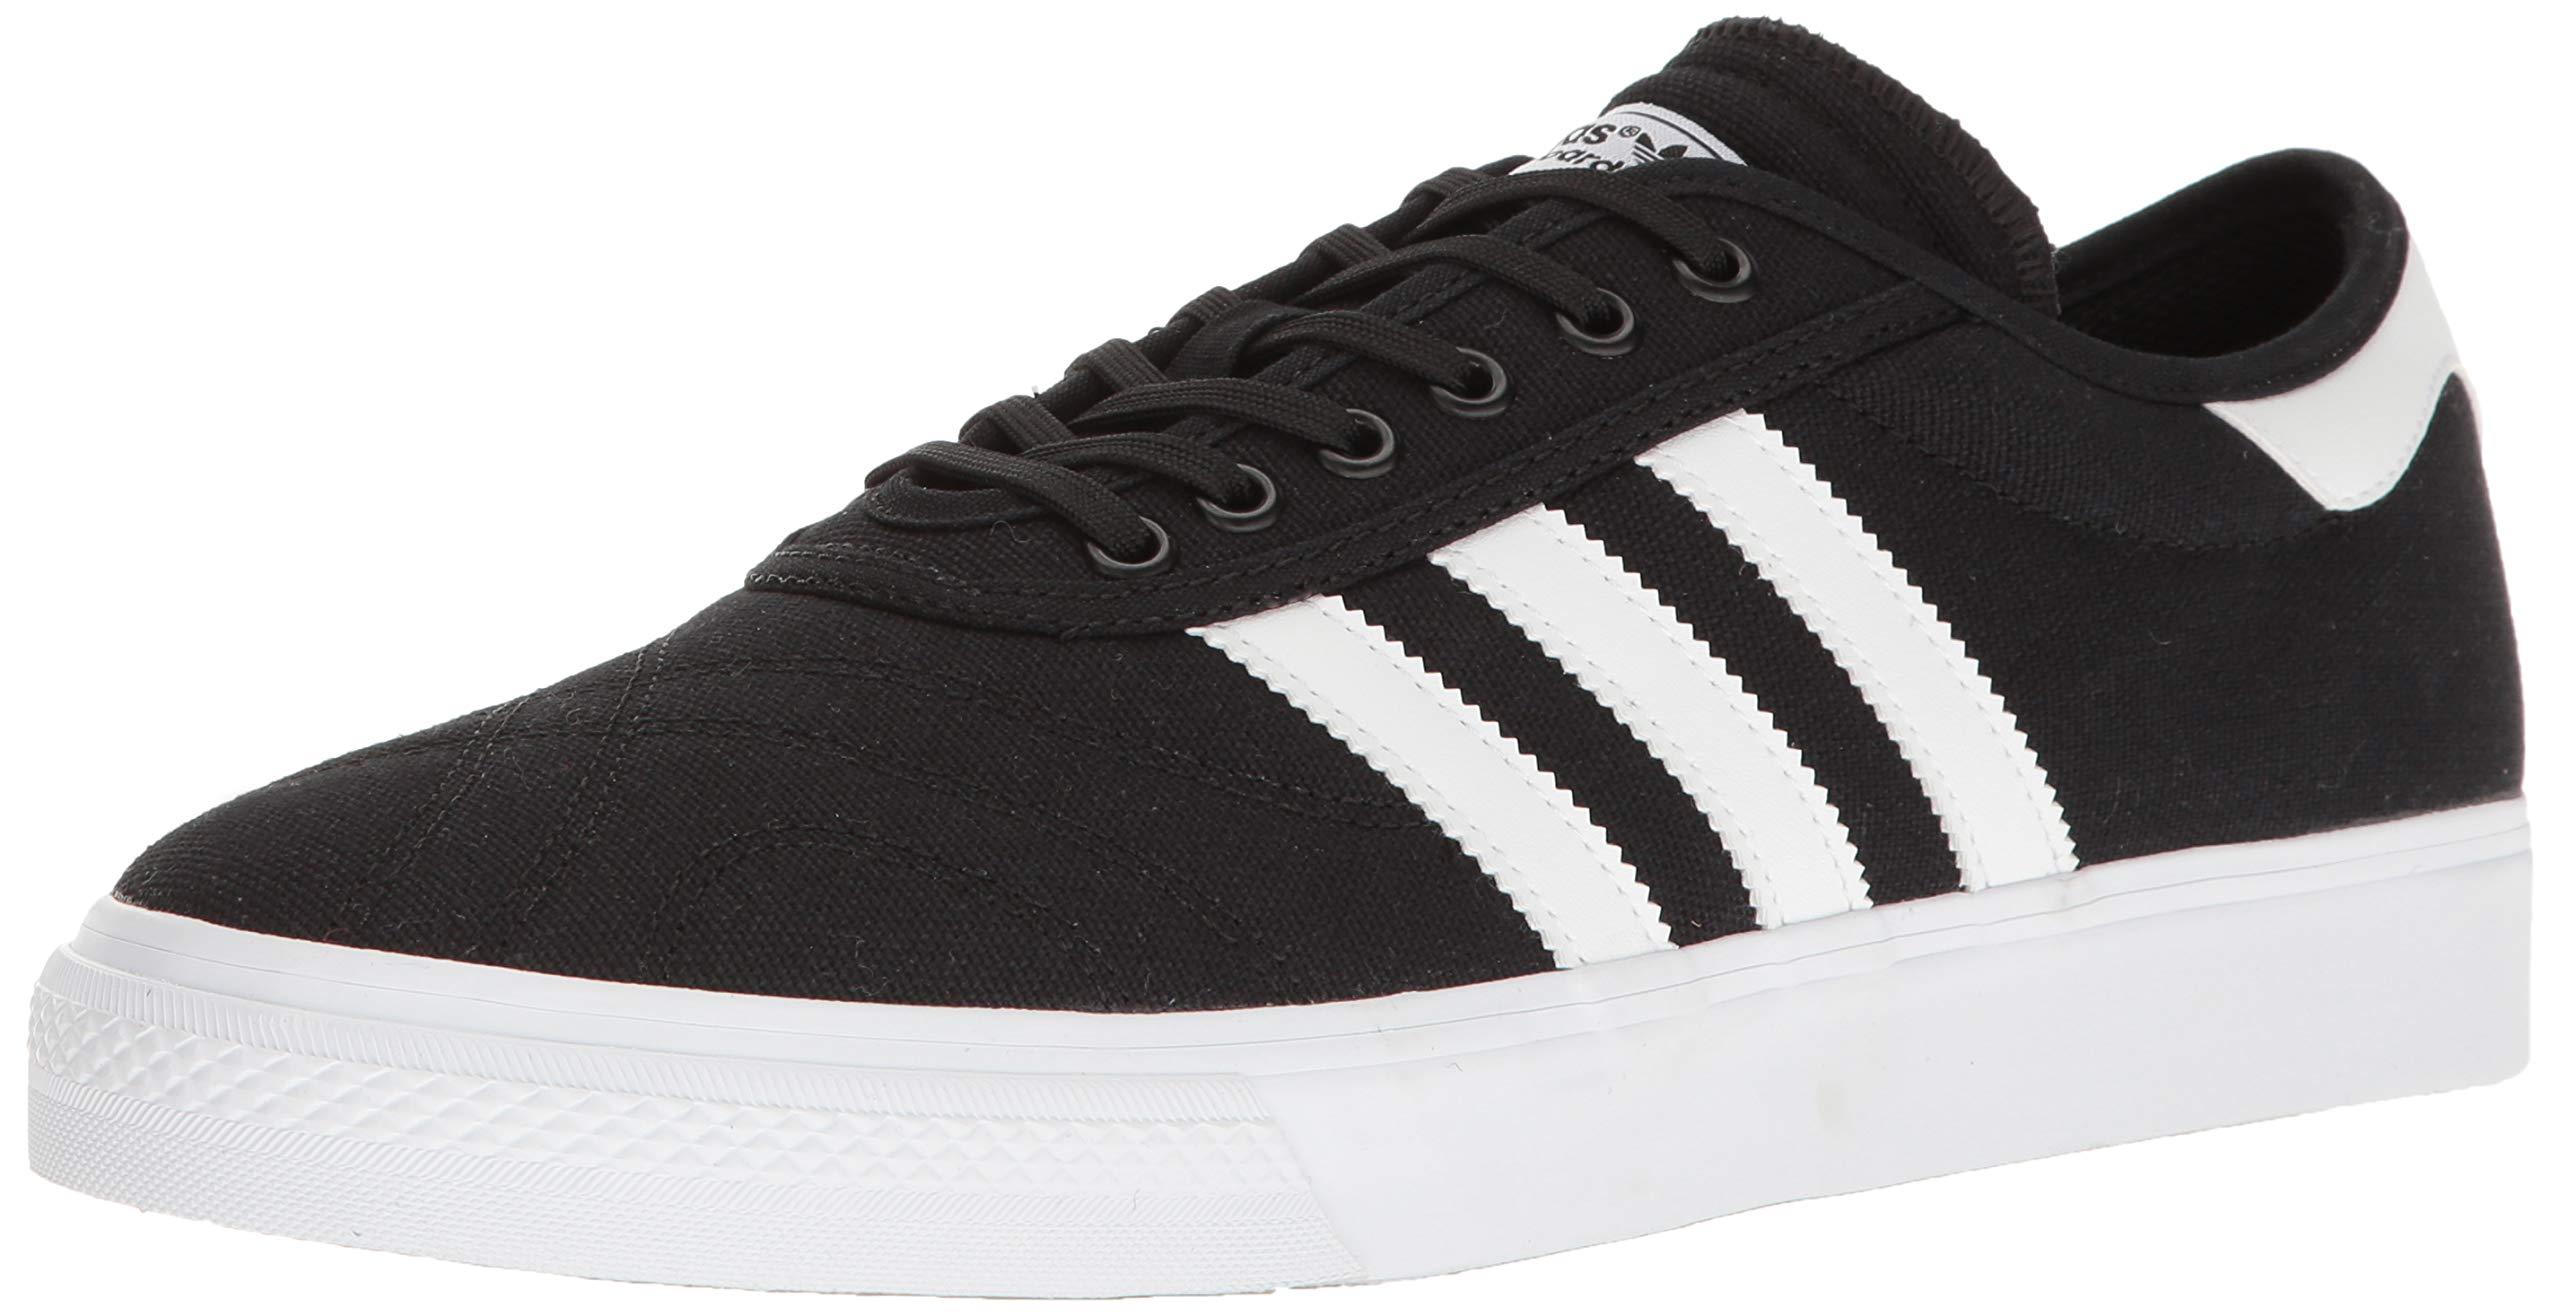 adidas Originals Men's Adi-Ease Premiere Fashion Sneaker, Black/White/Gum, (11 M US)